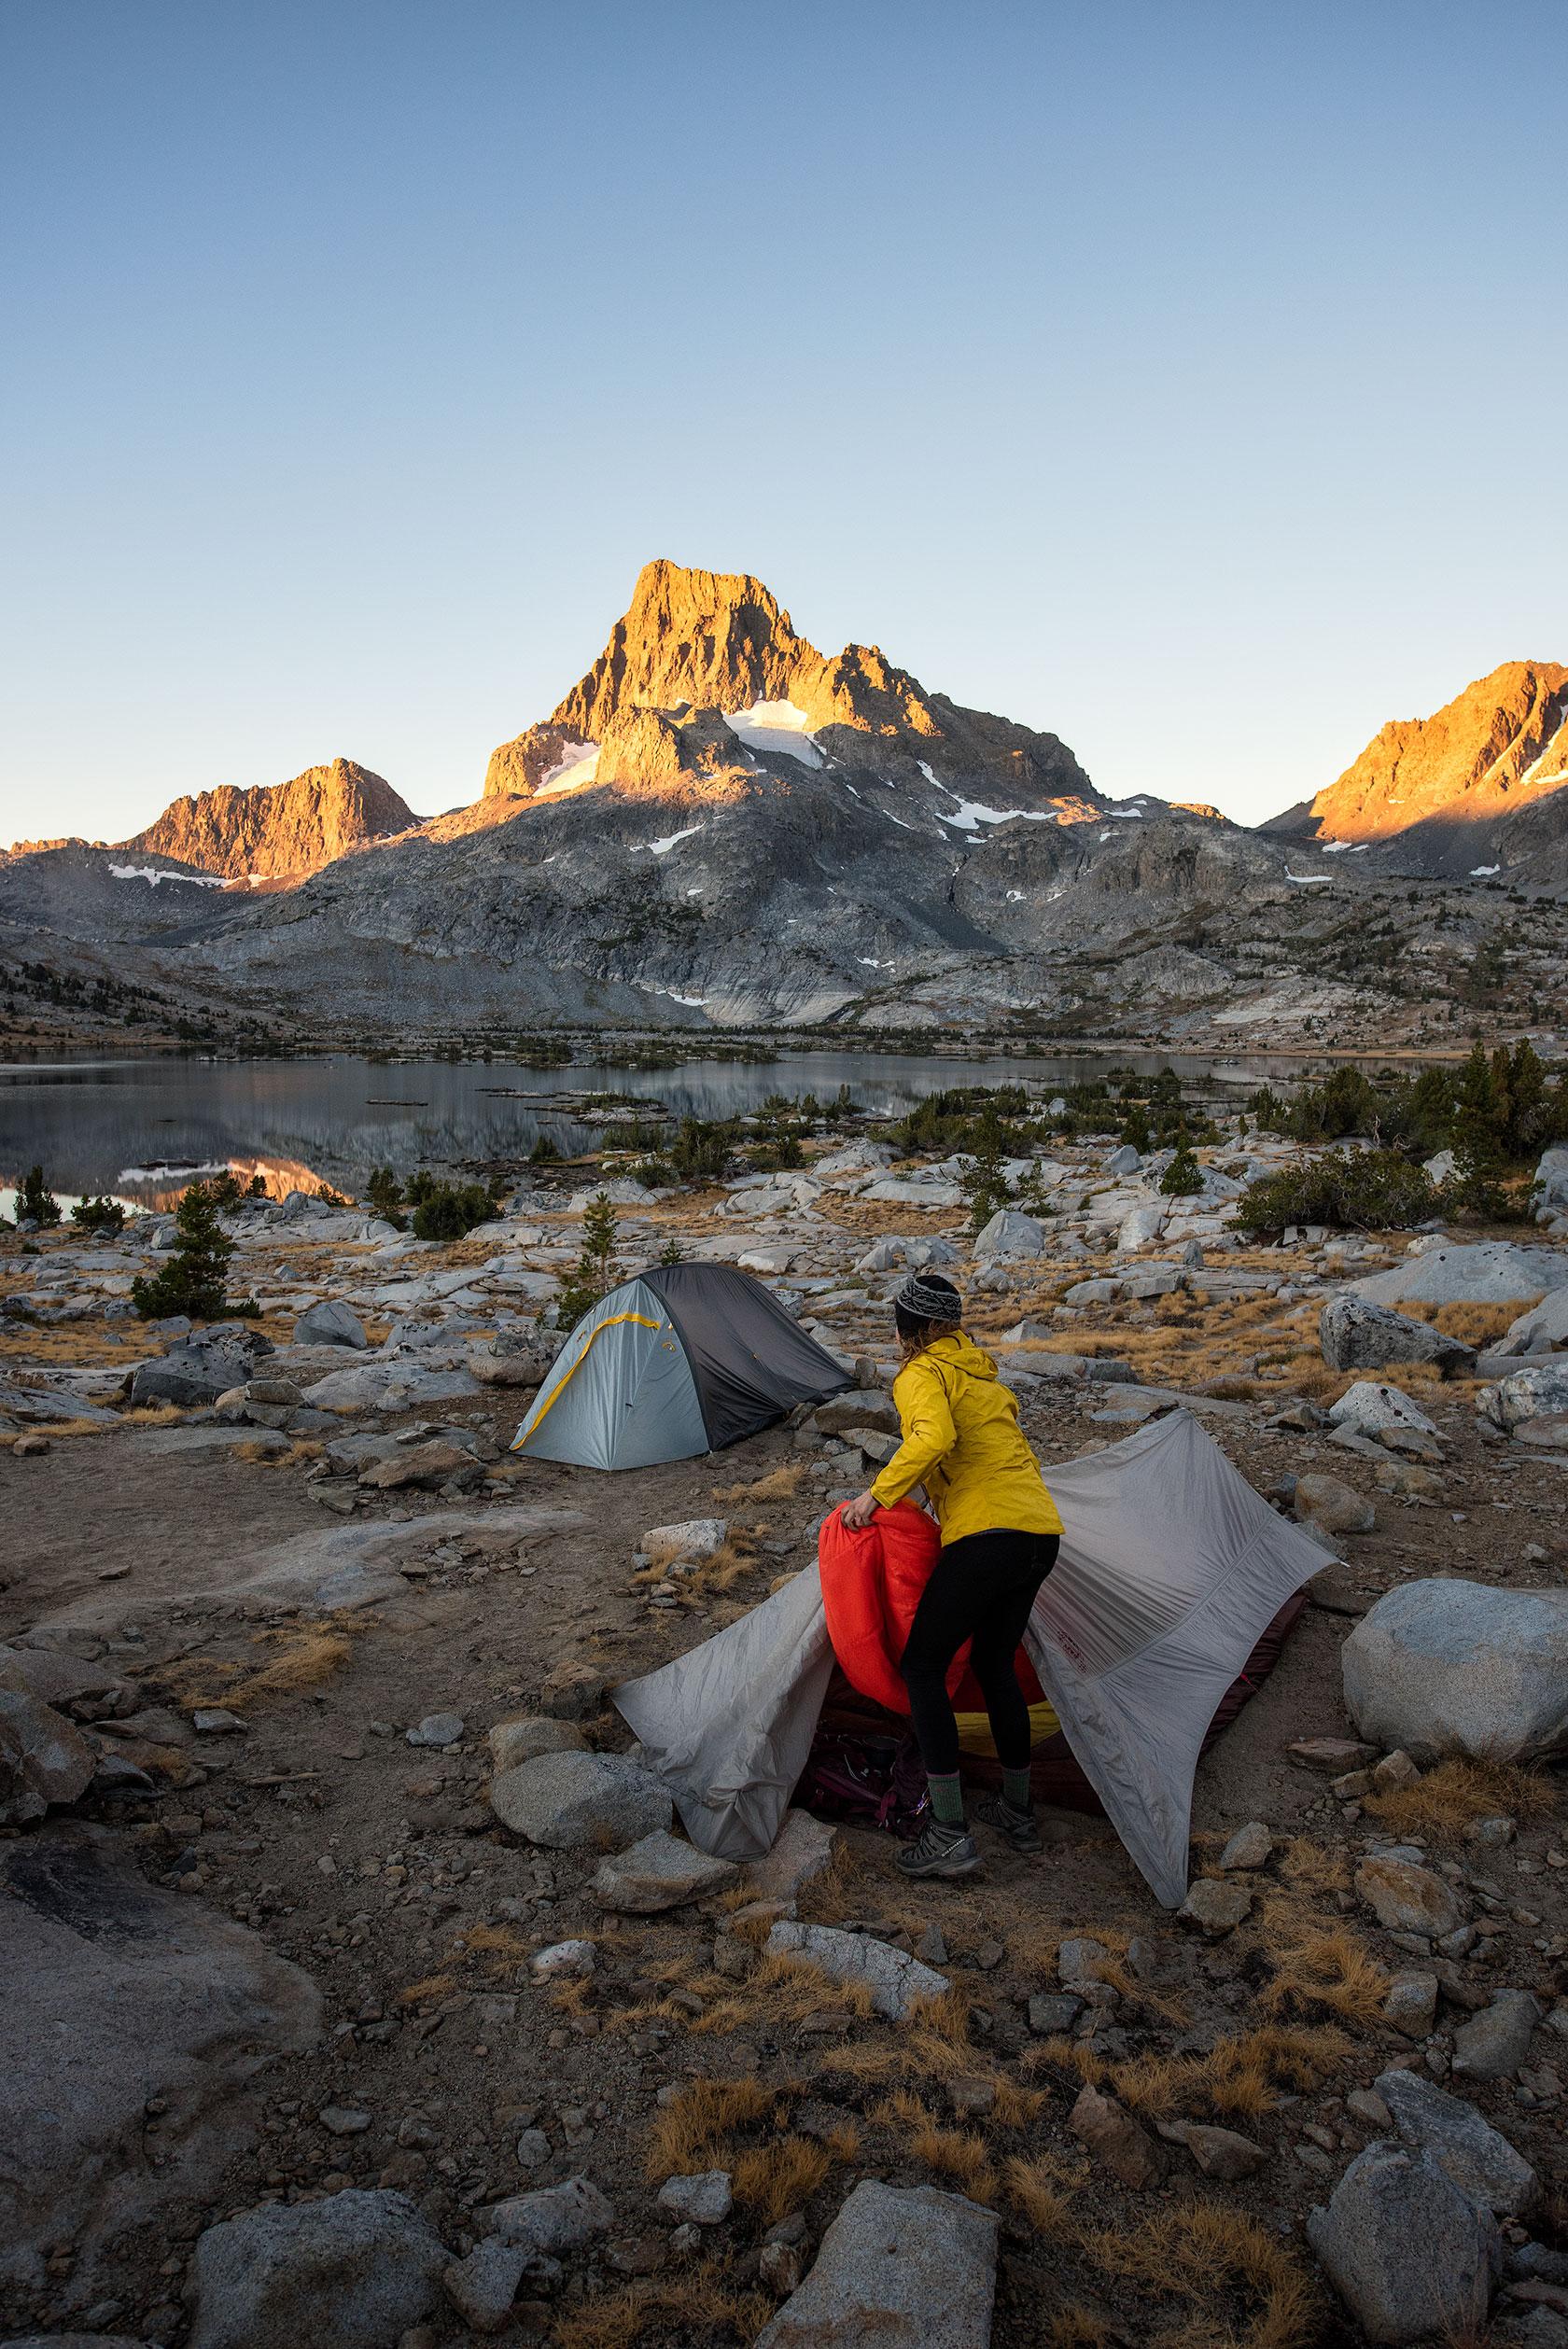 austin-trigg-big-agnes-tent-john-muir-trail-camping-sleeping-bag-thousand-Island-Lake-sunrise.jpg